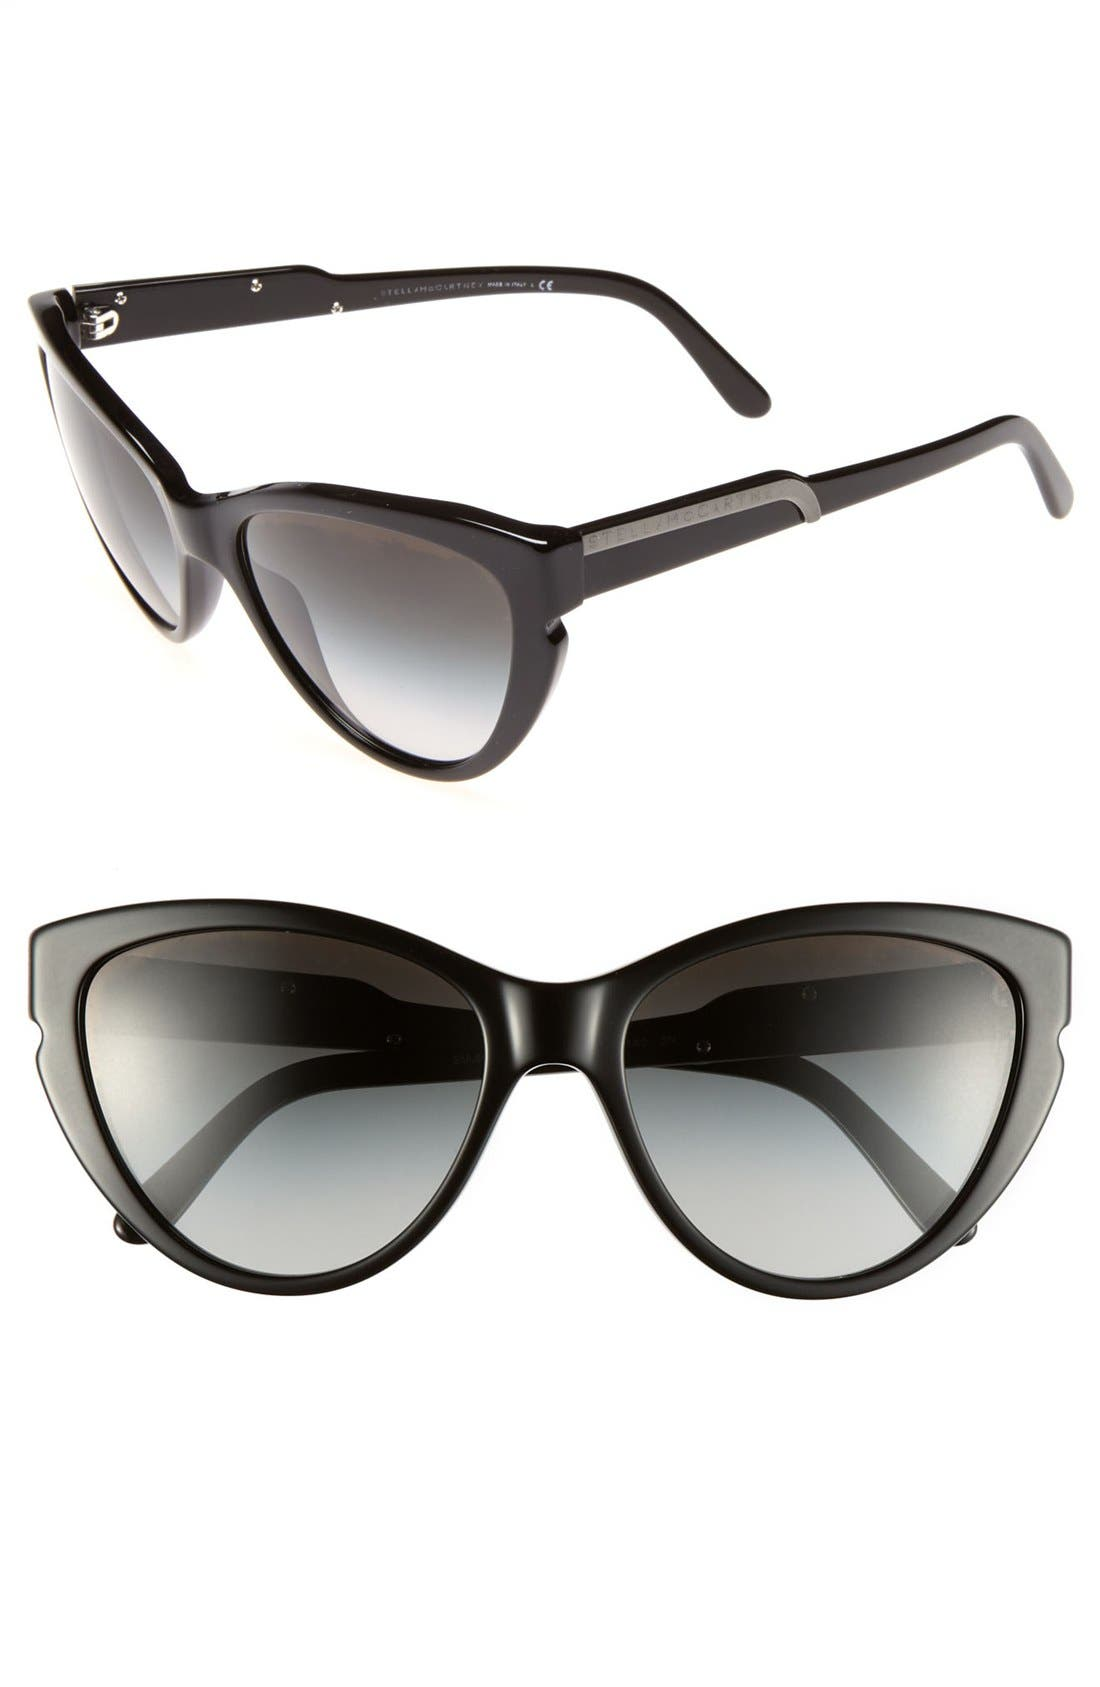 58mm Cat's Eye Sunglasses,                             Main thumbnail 1, color,                             001